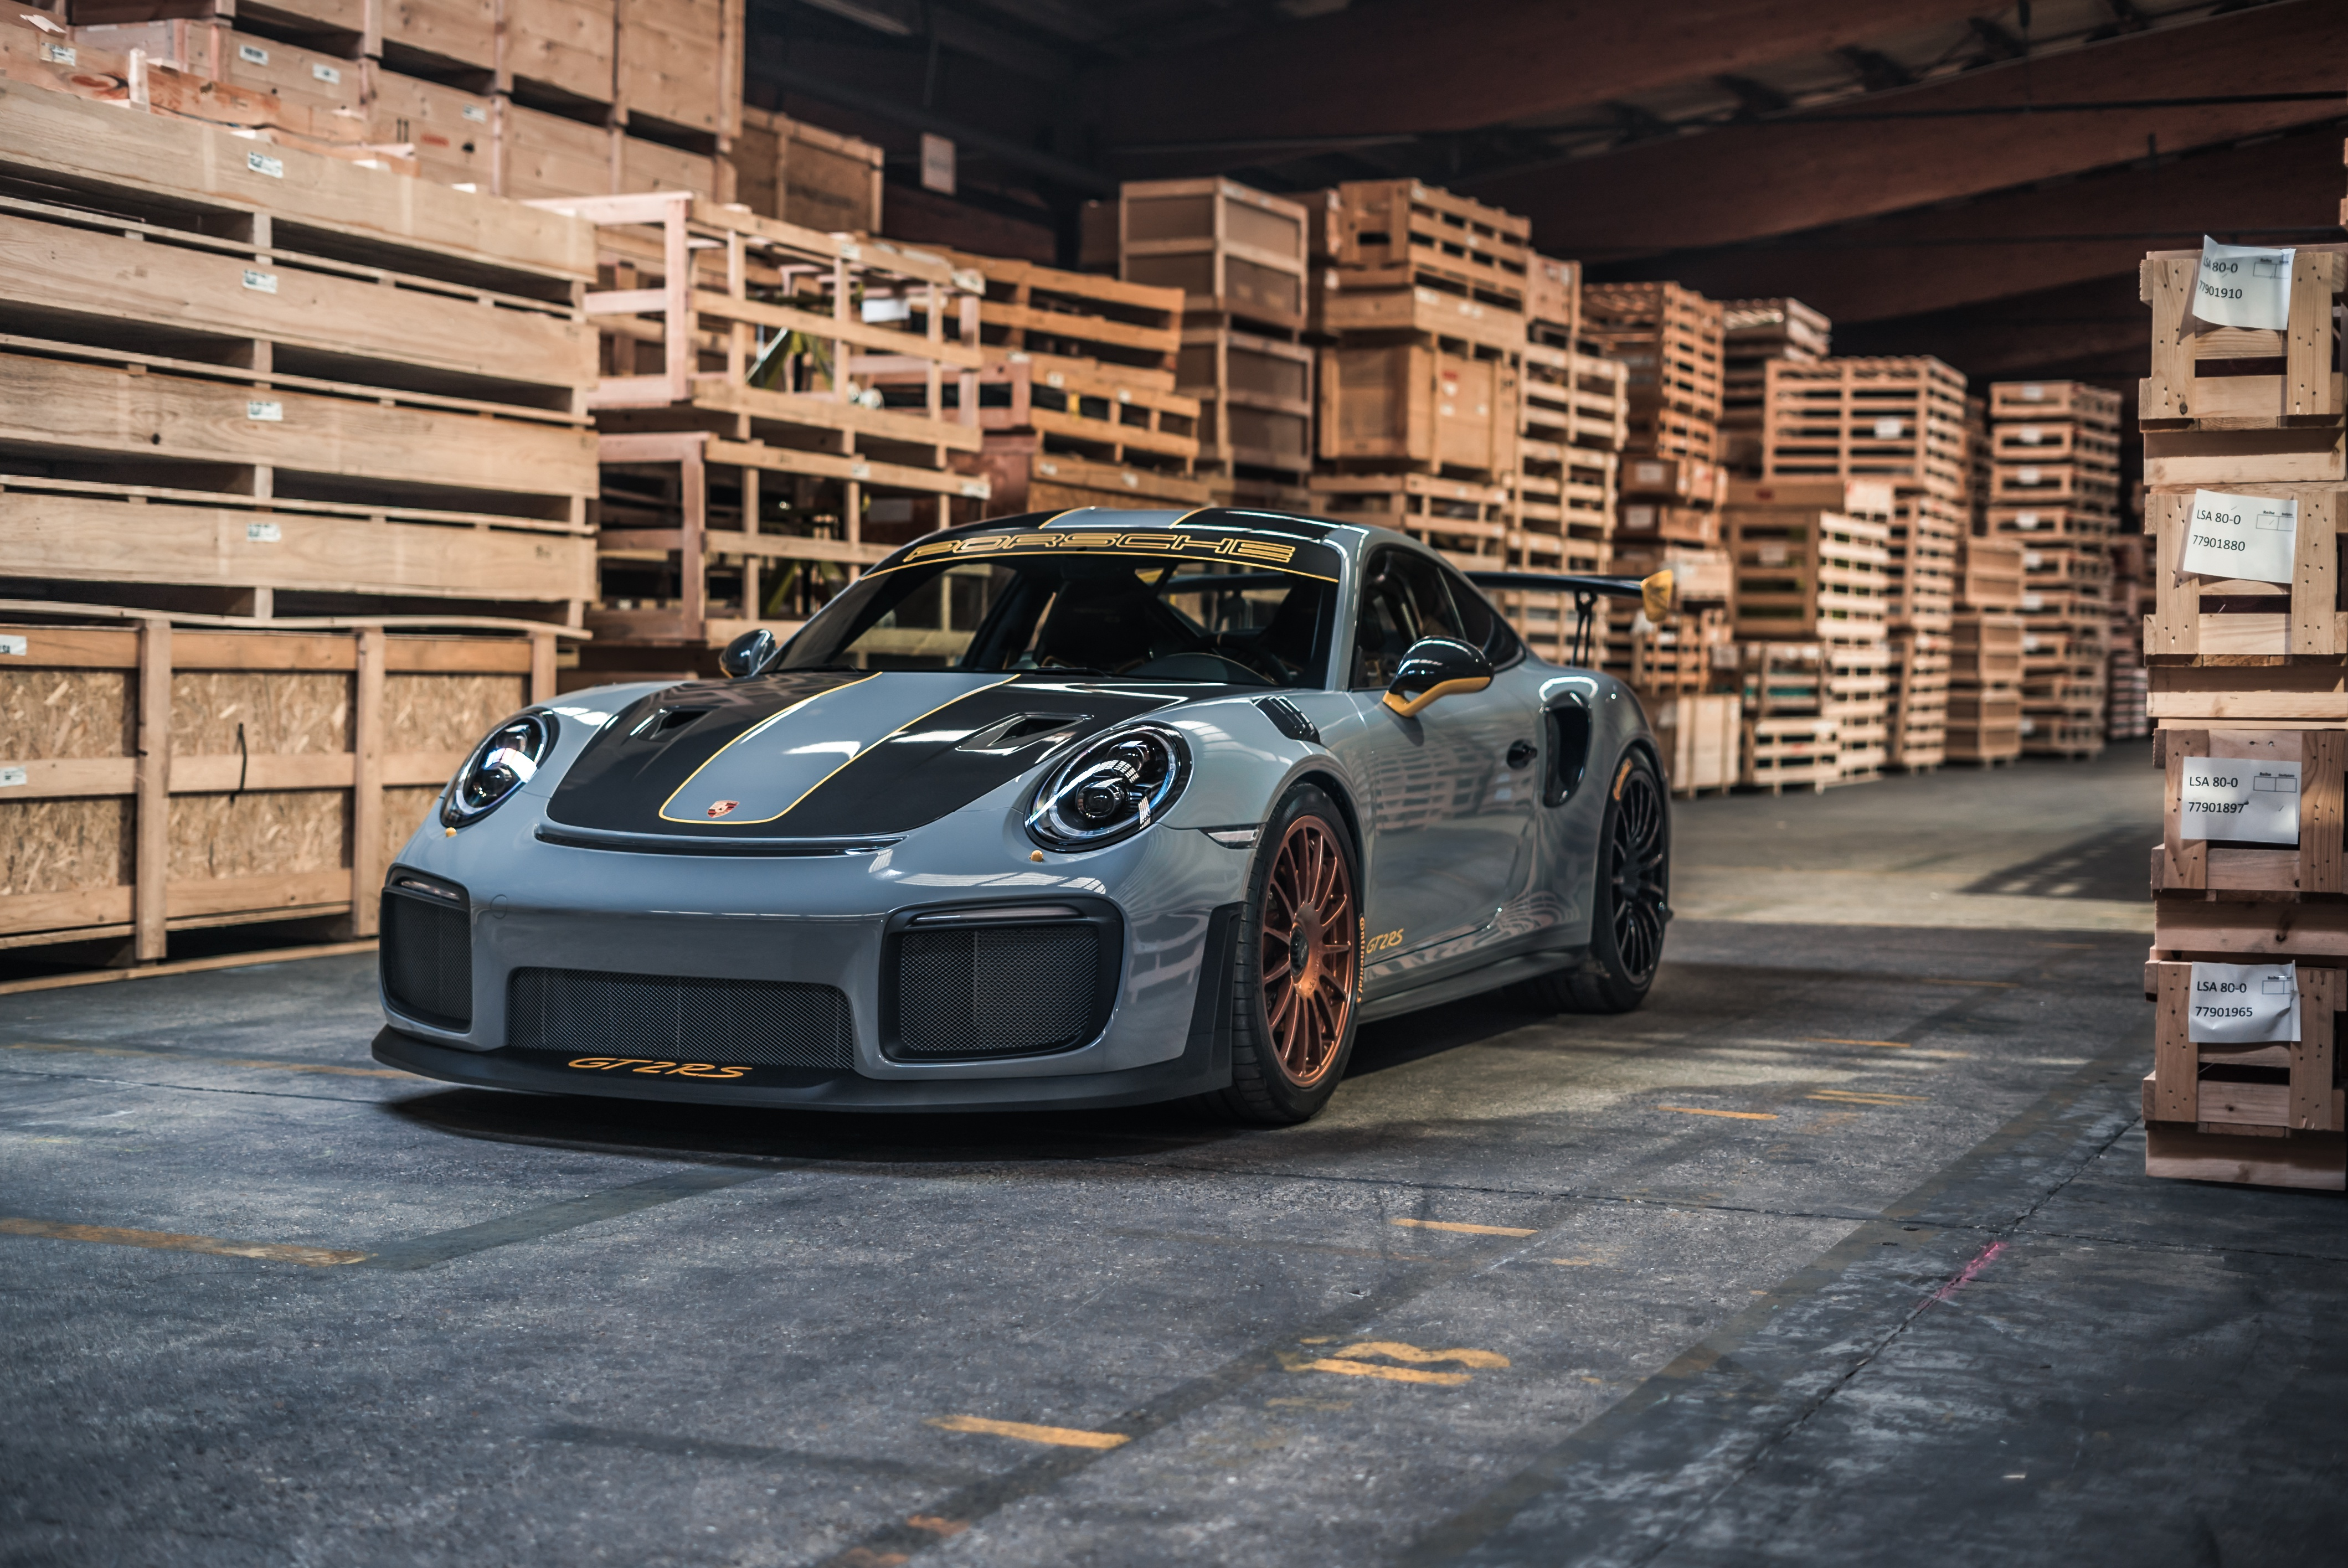 Porsche 911 Gt2 Rs 4k Ultra Hd Wallpaper Background Image 4240x2832 Id 1070231 Wallpaper Abyss